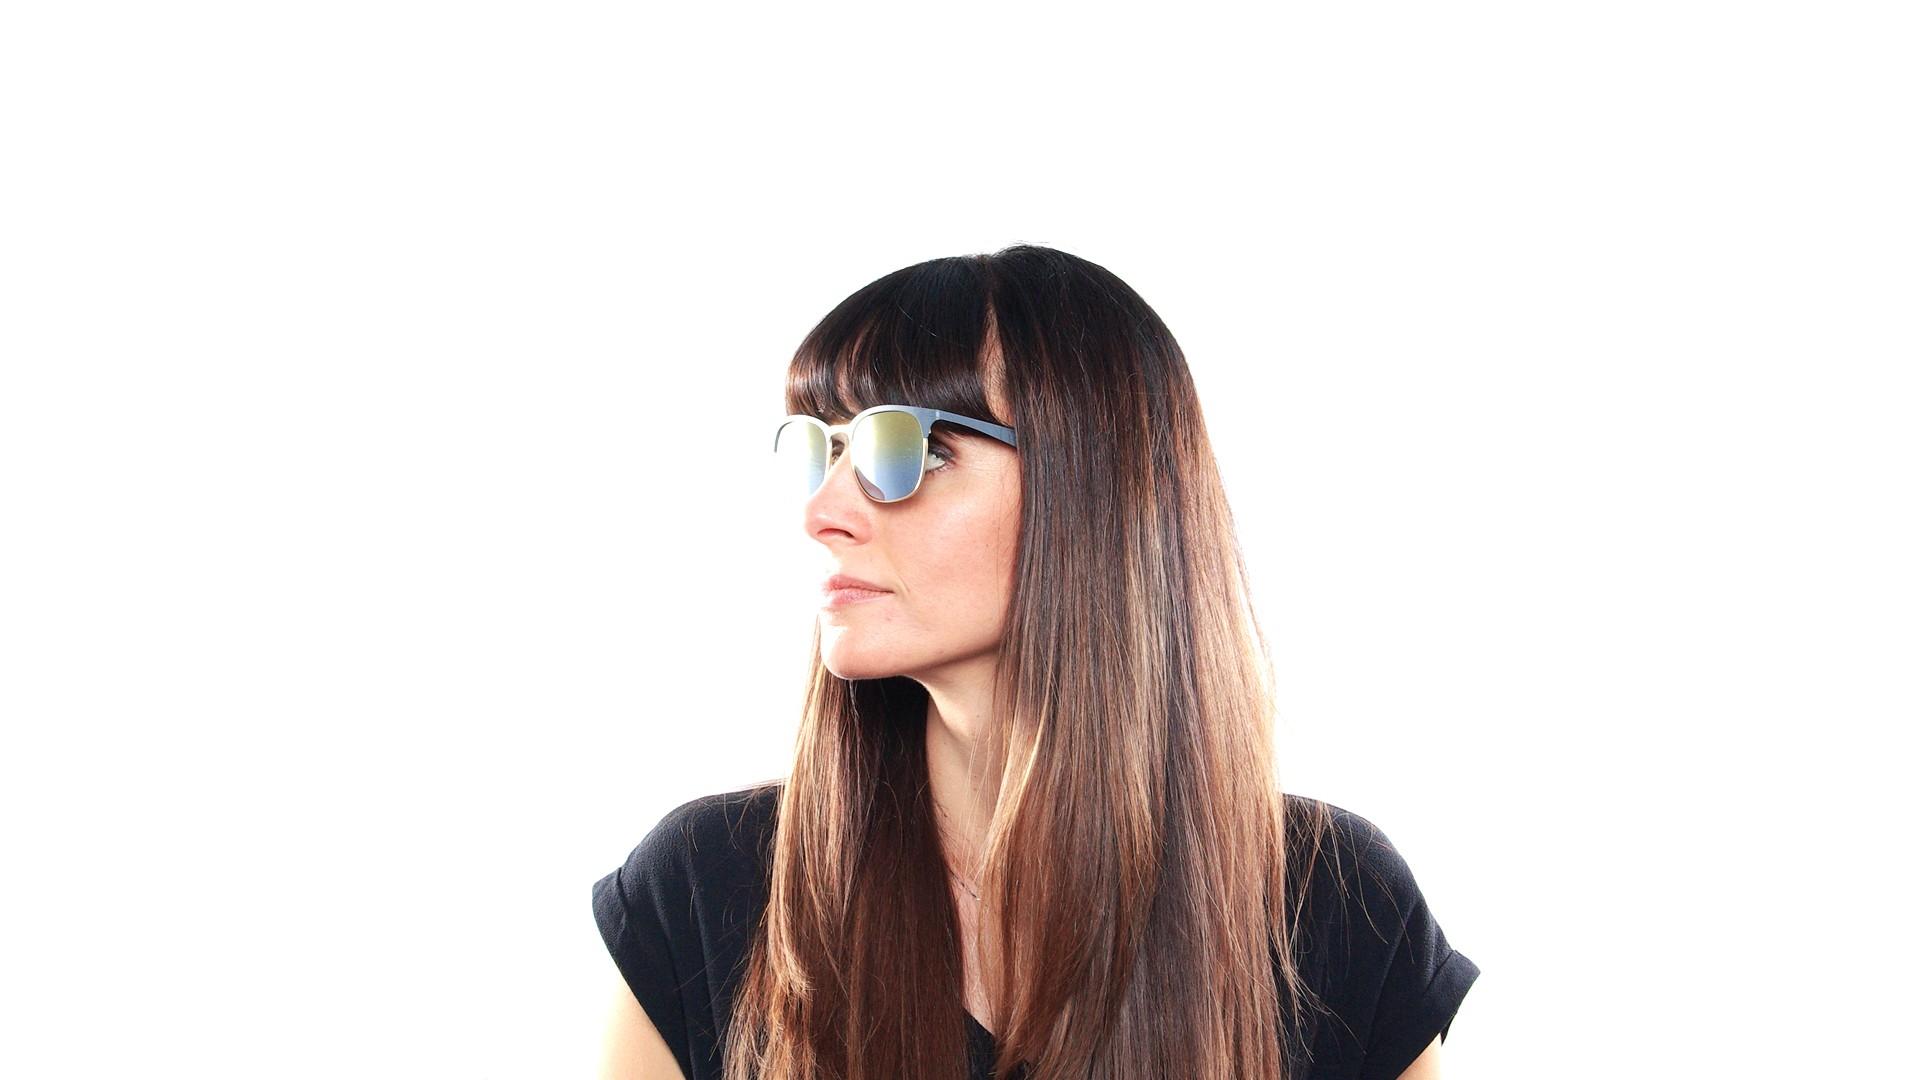 097a7cc6d7 Sunglasses Ray-Ban RB3538 9007 A7 53-19 Grey Matte Medium Gradient Mirror